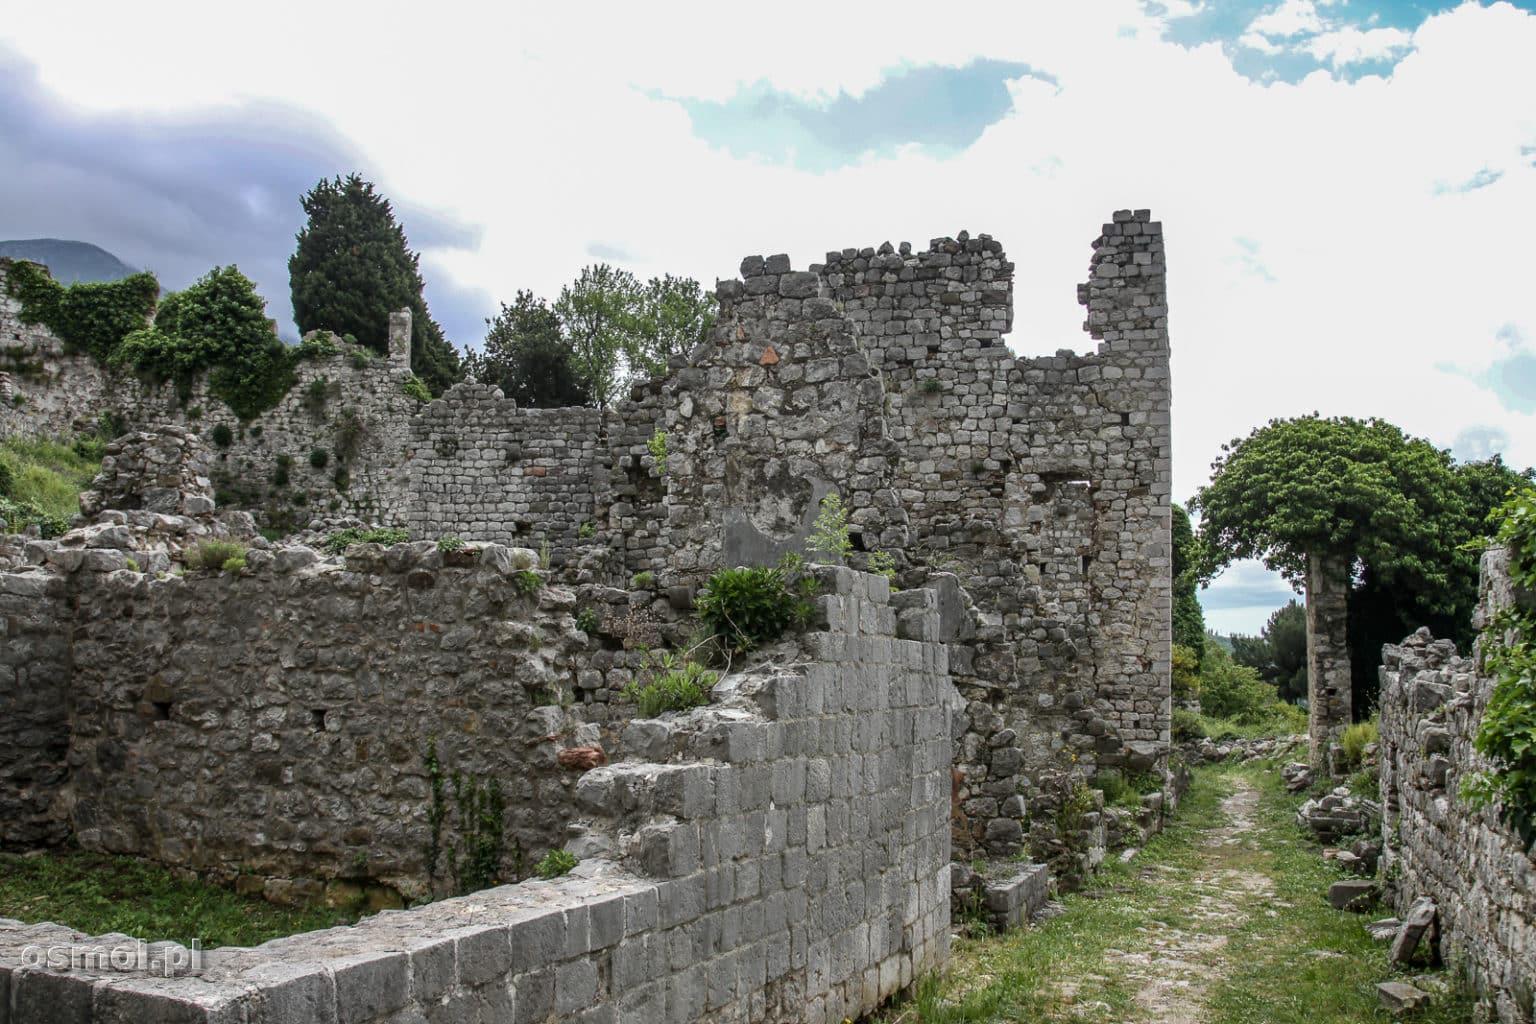 Uliczka w ruinach Starego Baru